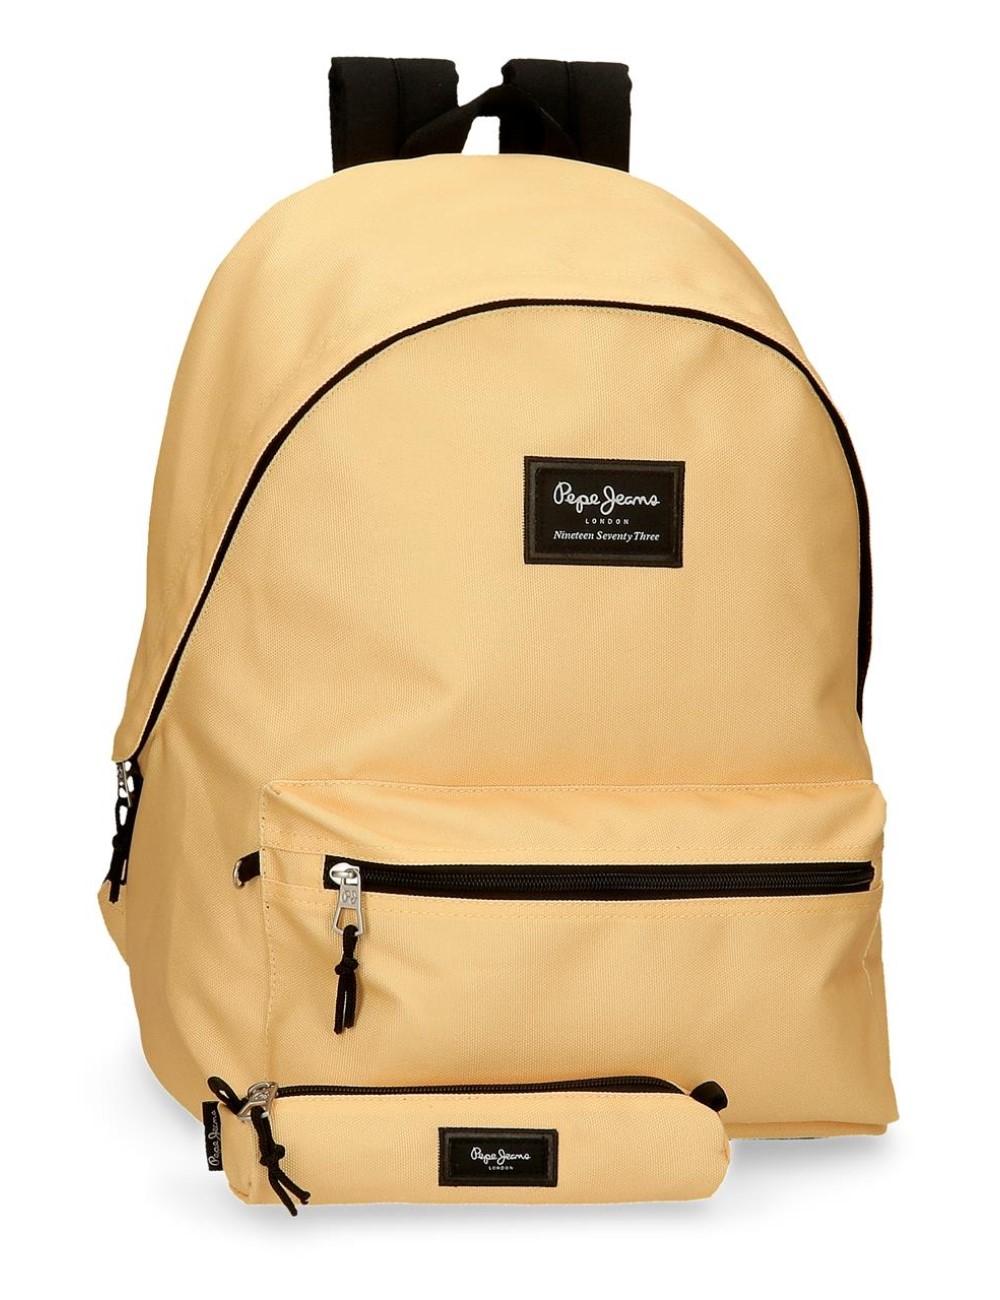 Mochila Portaordenador + Portatodo Pepe Jeans Colorful Amarillo Pastel 6329226